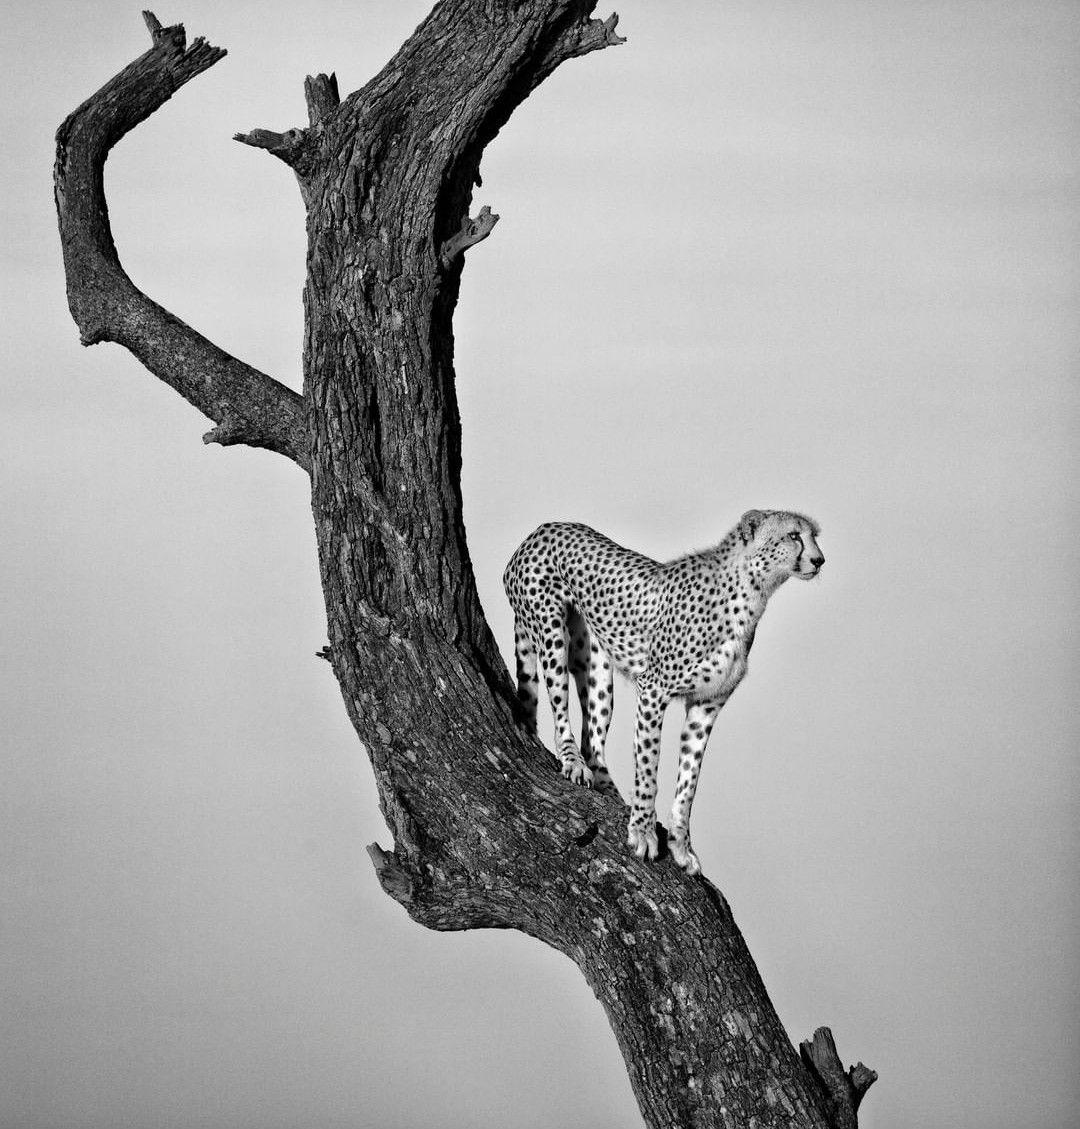 Pin by saad akhtar malik on wild life Animals, Most